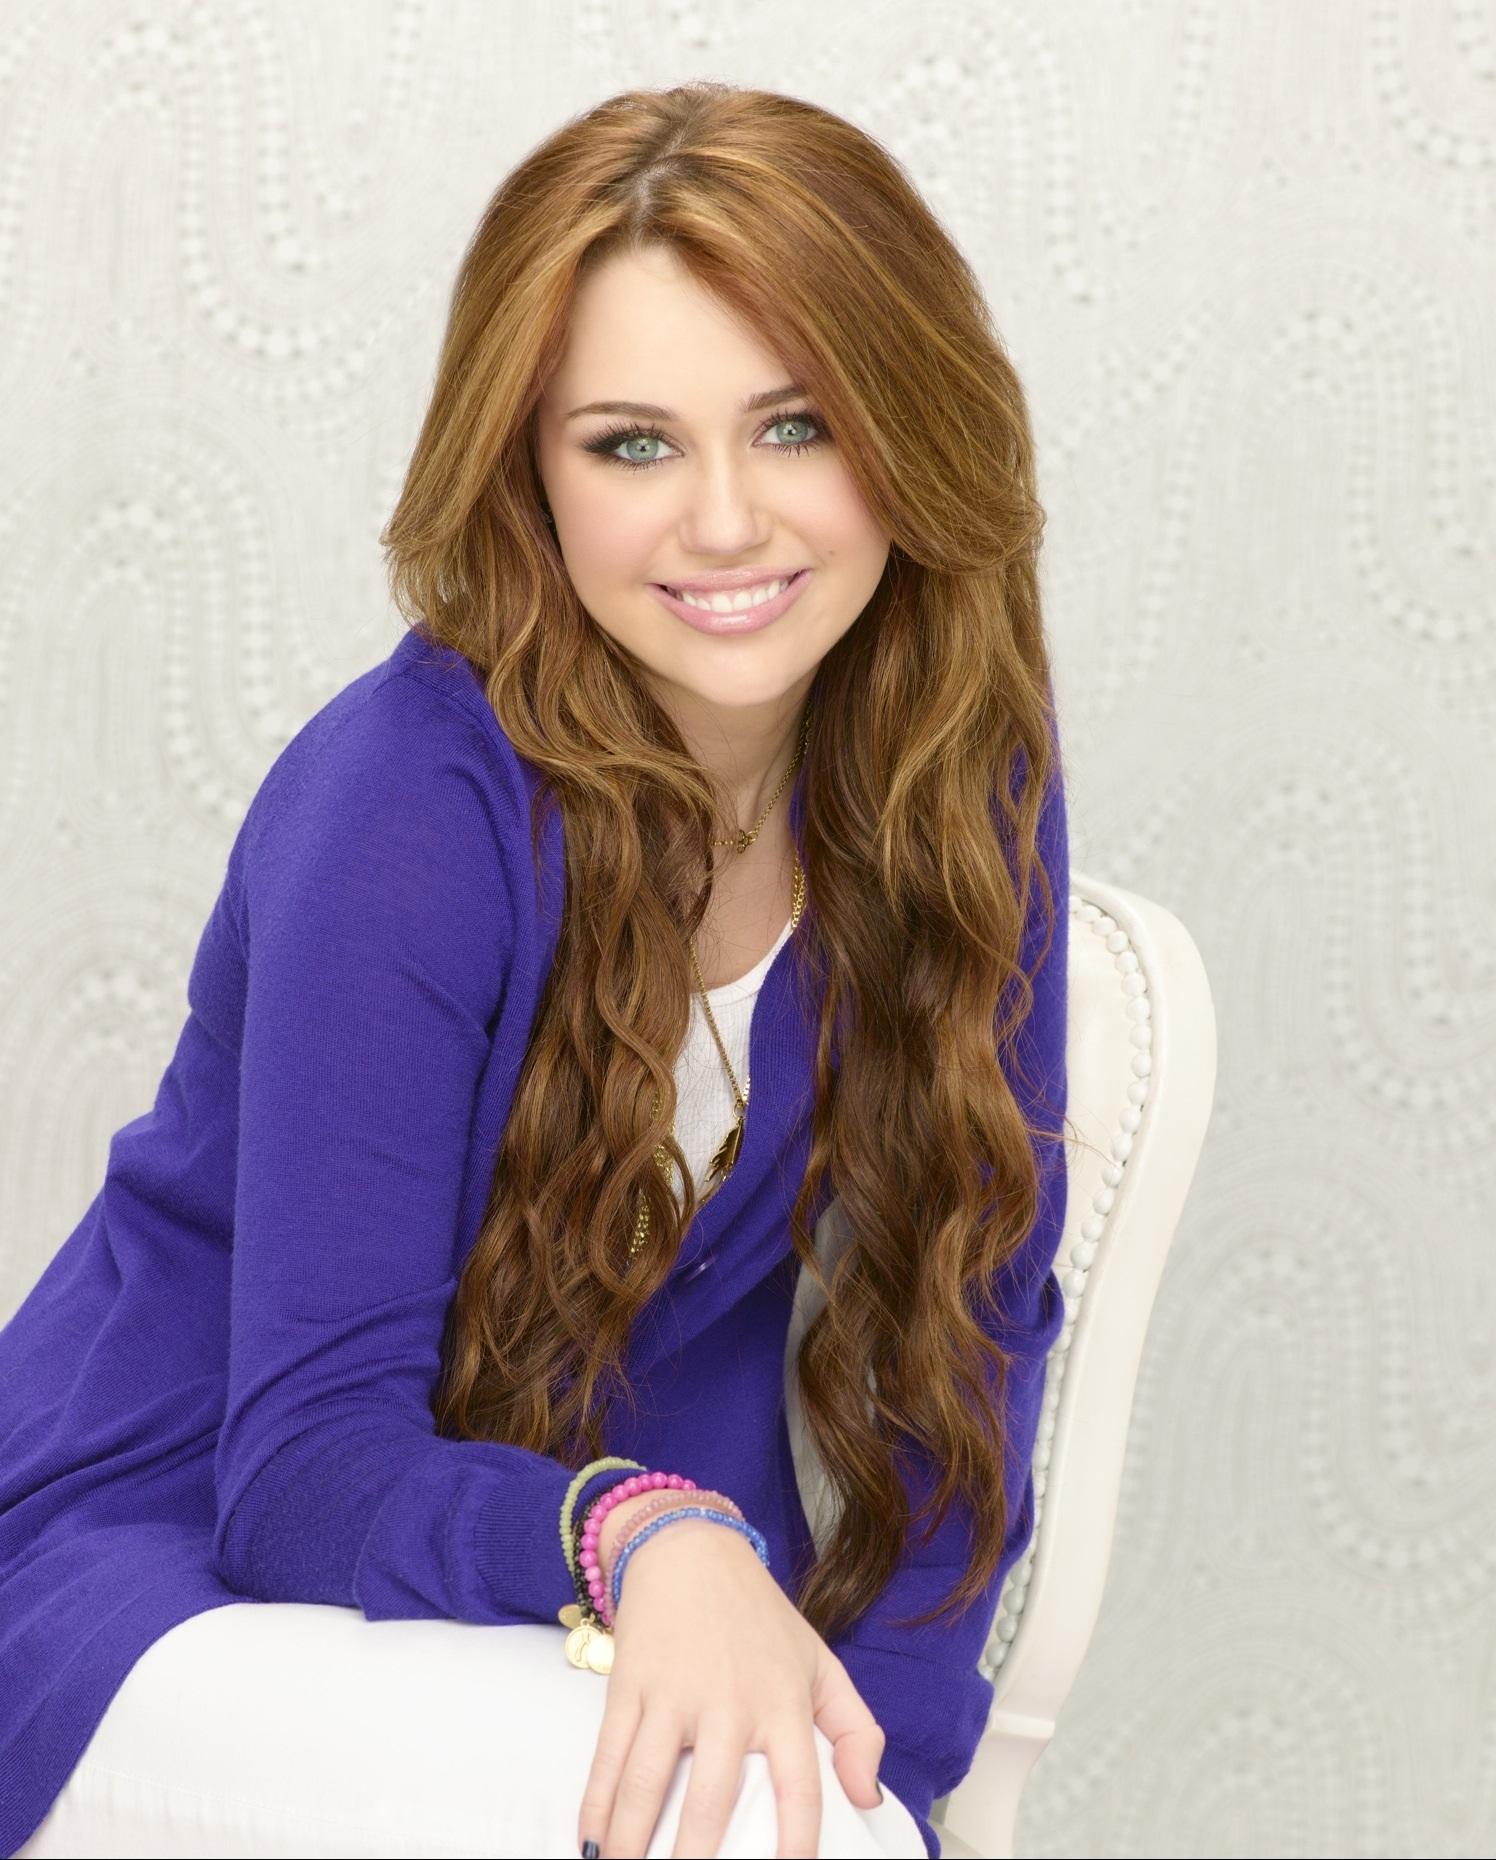 Miley Stewart (Hannah Montana)